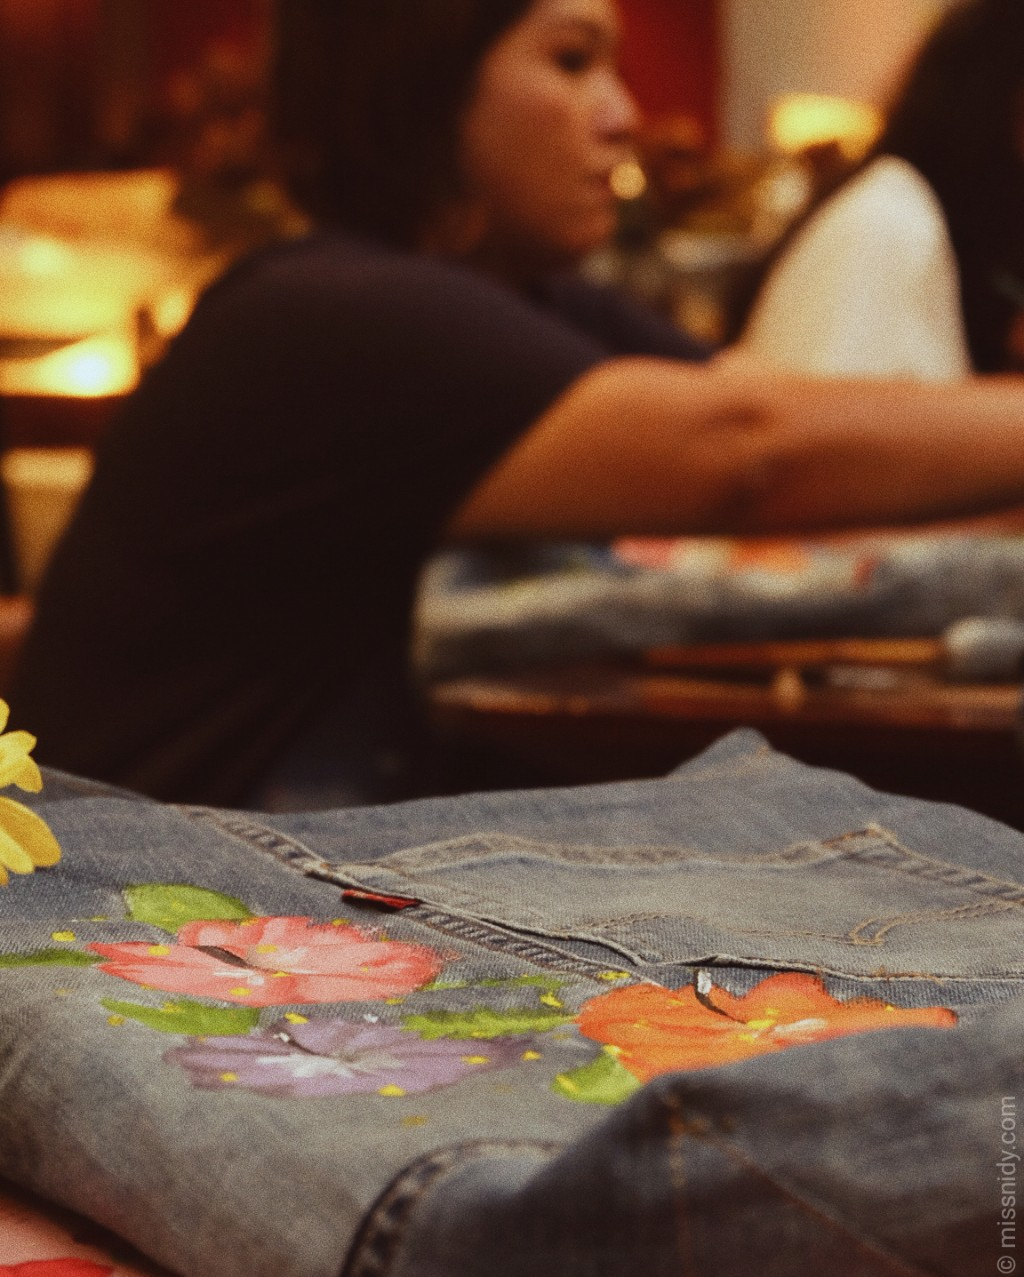 melukis di atas kain jeans levi's indonesia